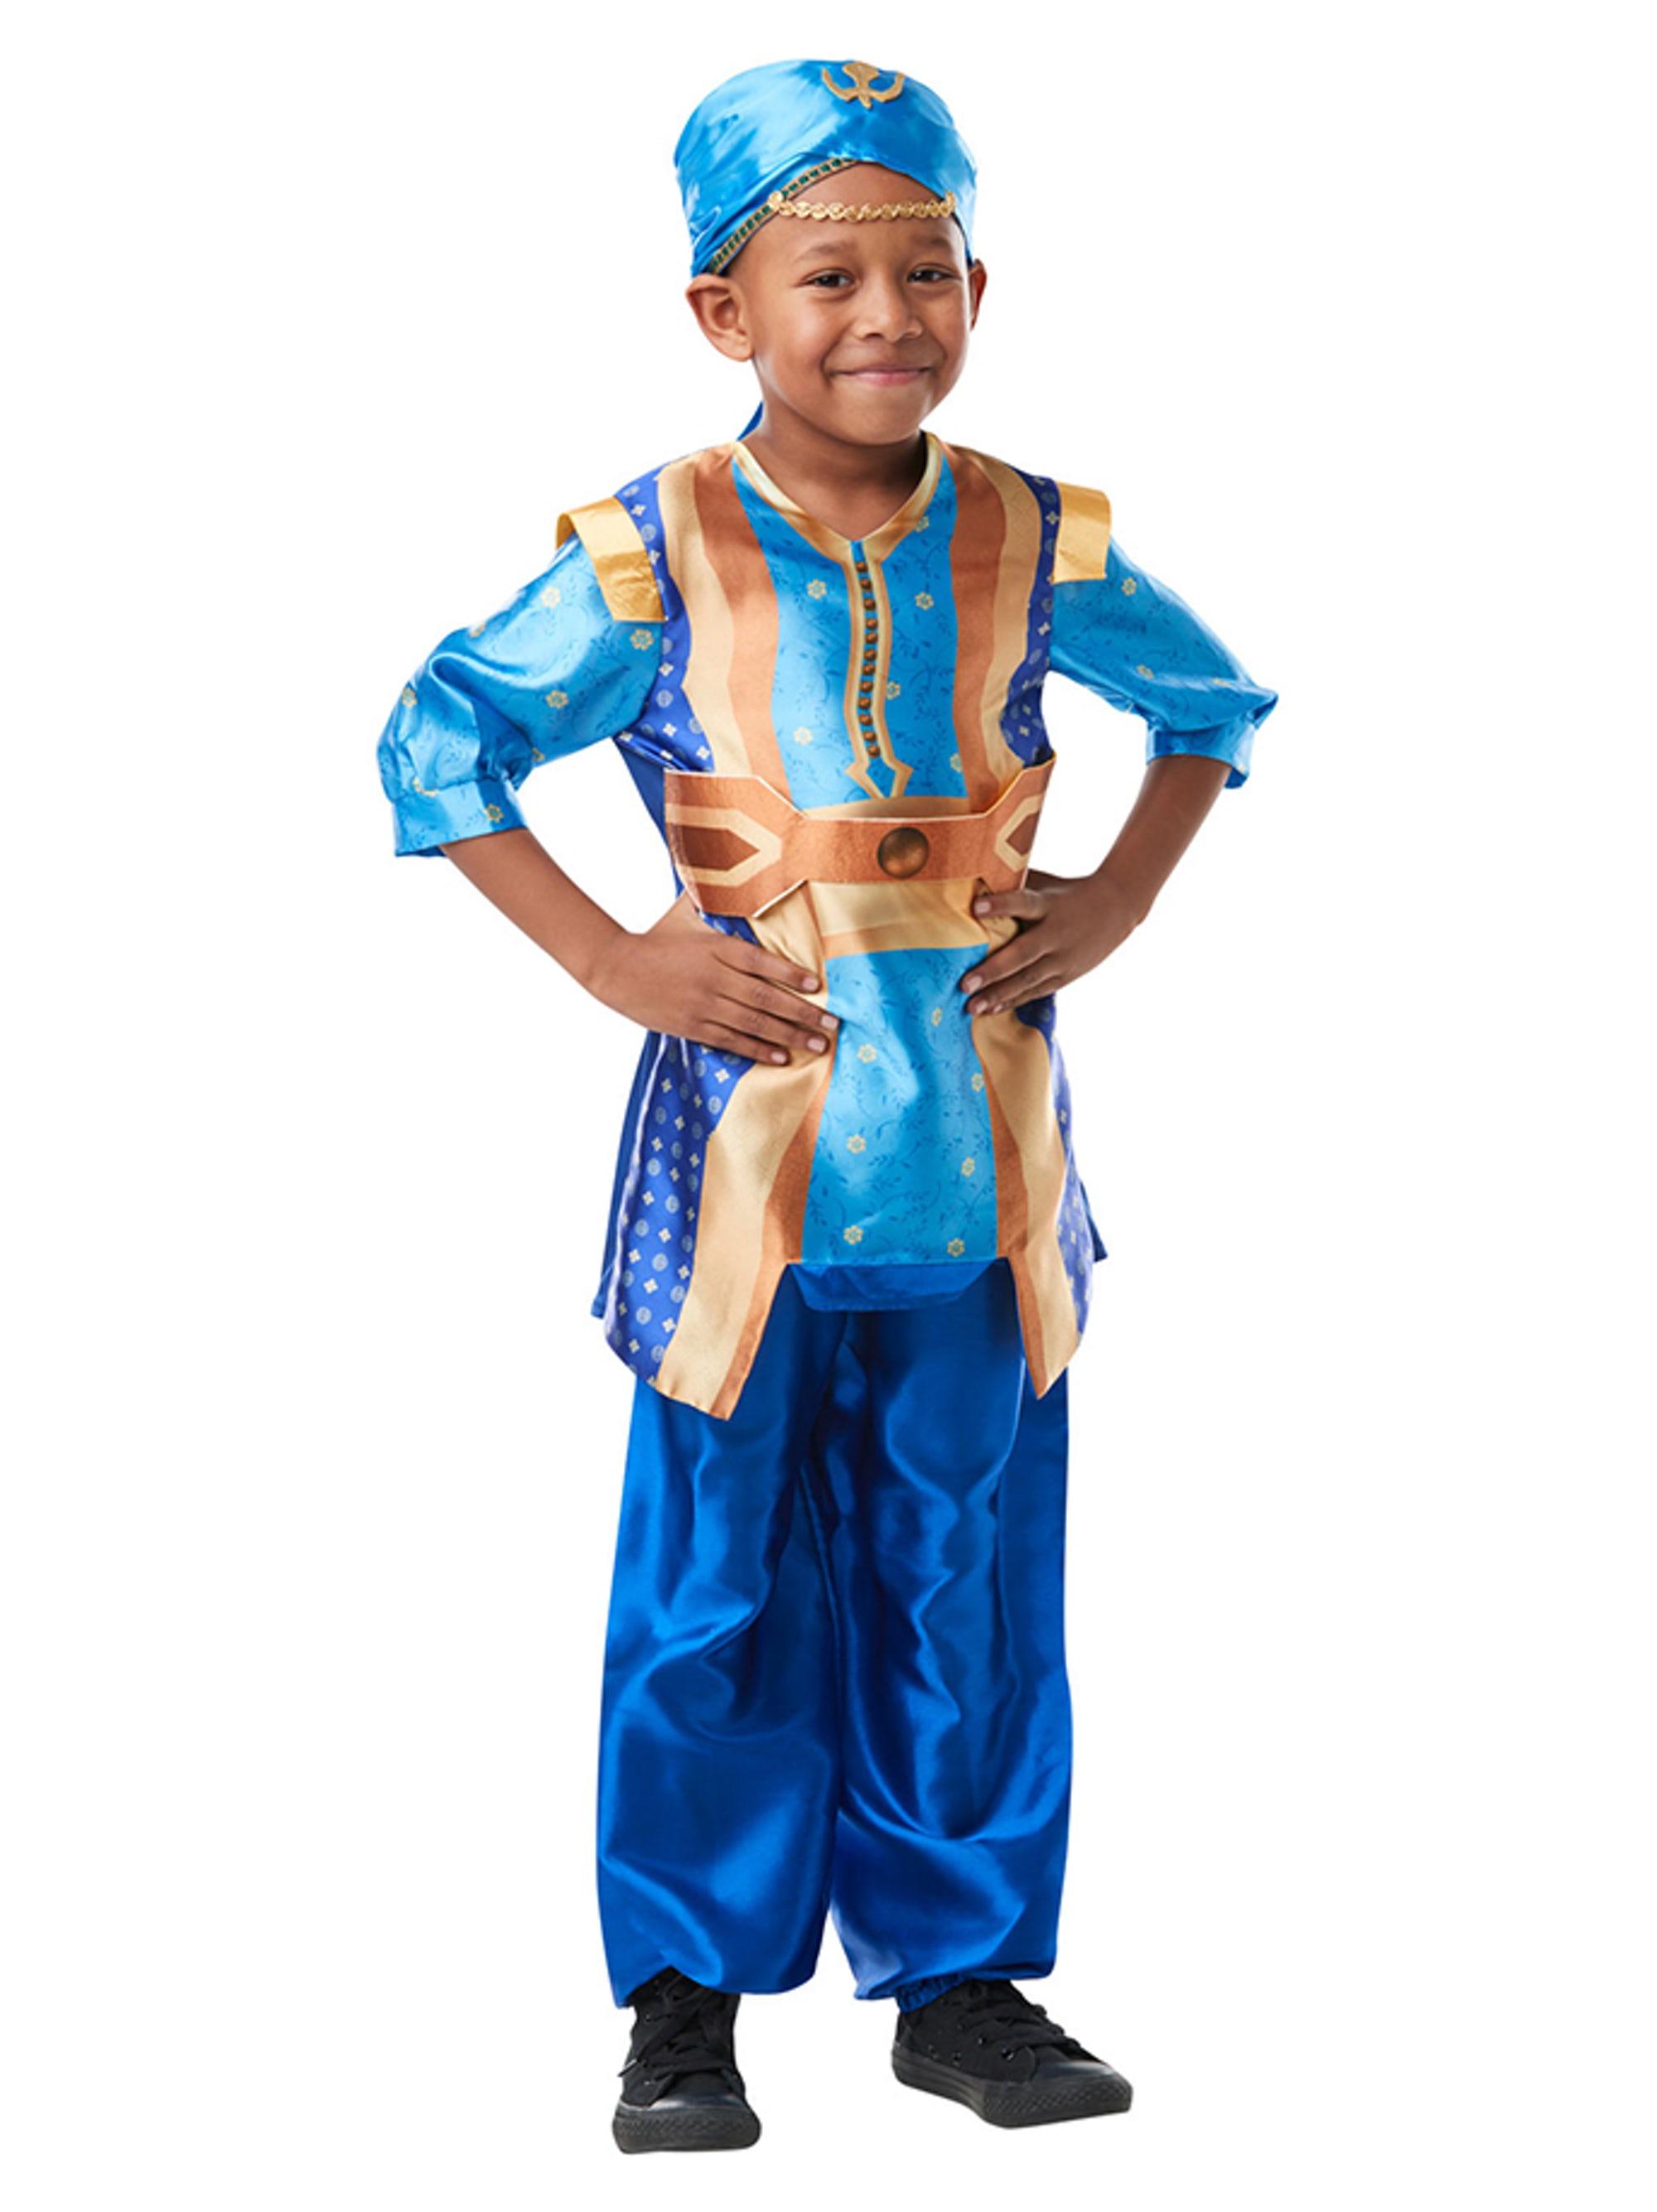 Genie kostume til børn - Aladdin kostume til børn